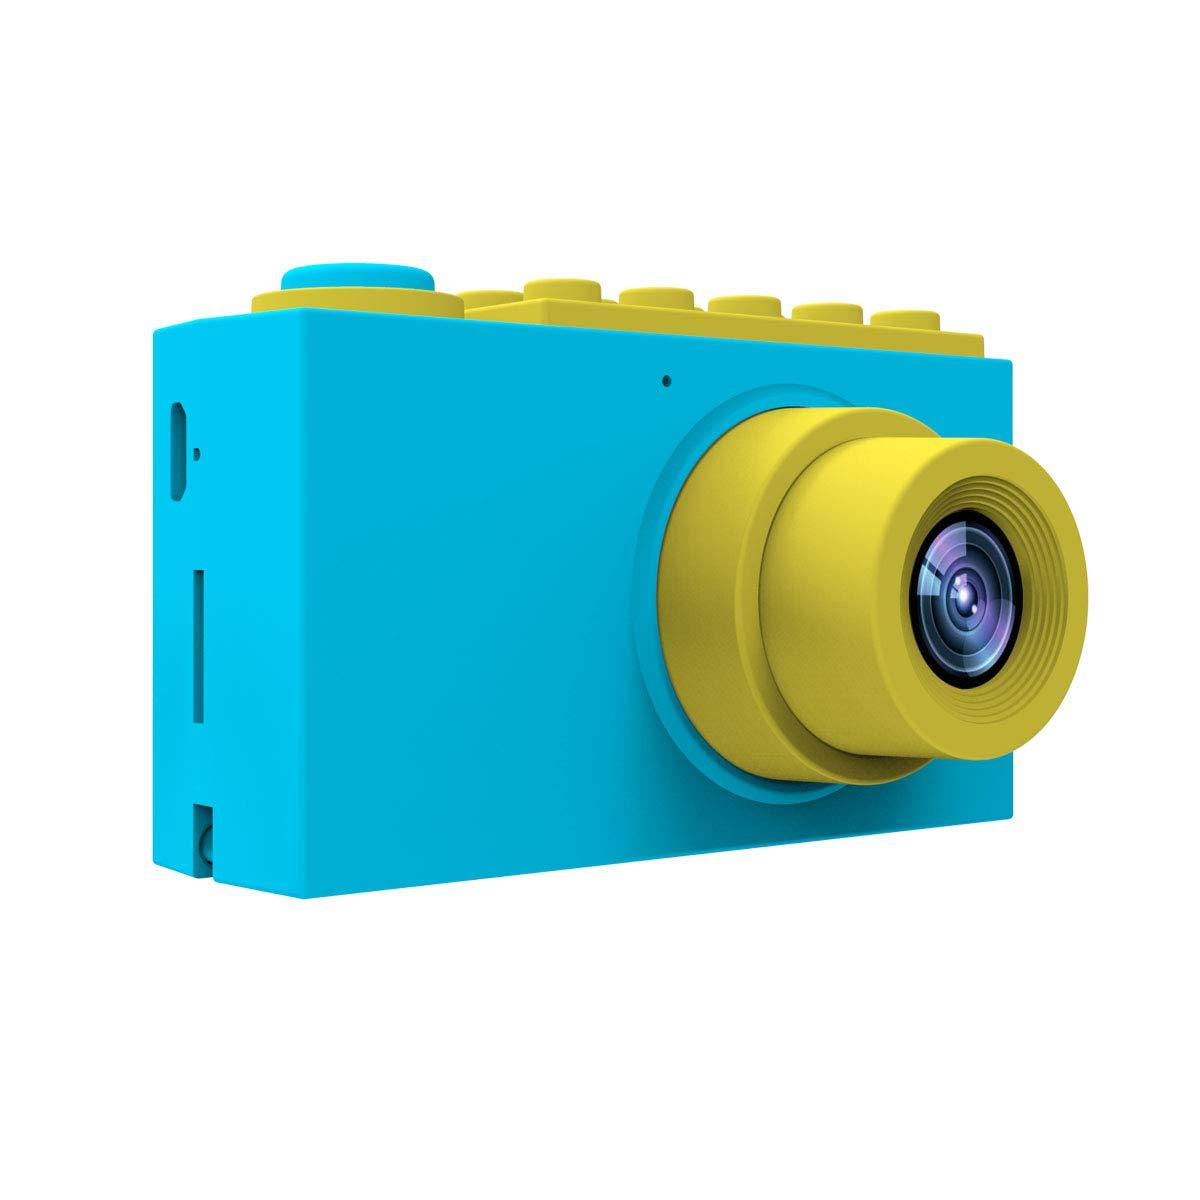 MAGENDARA Kids Digital Camera HD 1080P Children Camera 2.0 Inch Screen Toy Camera Boys Girls Birthday